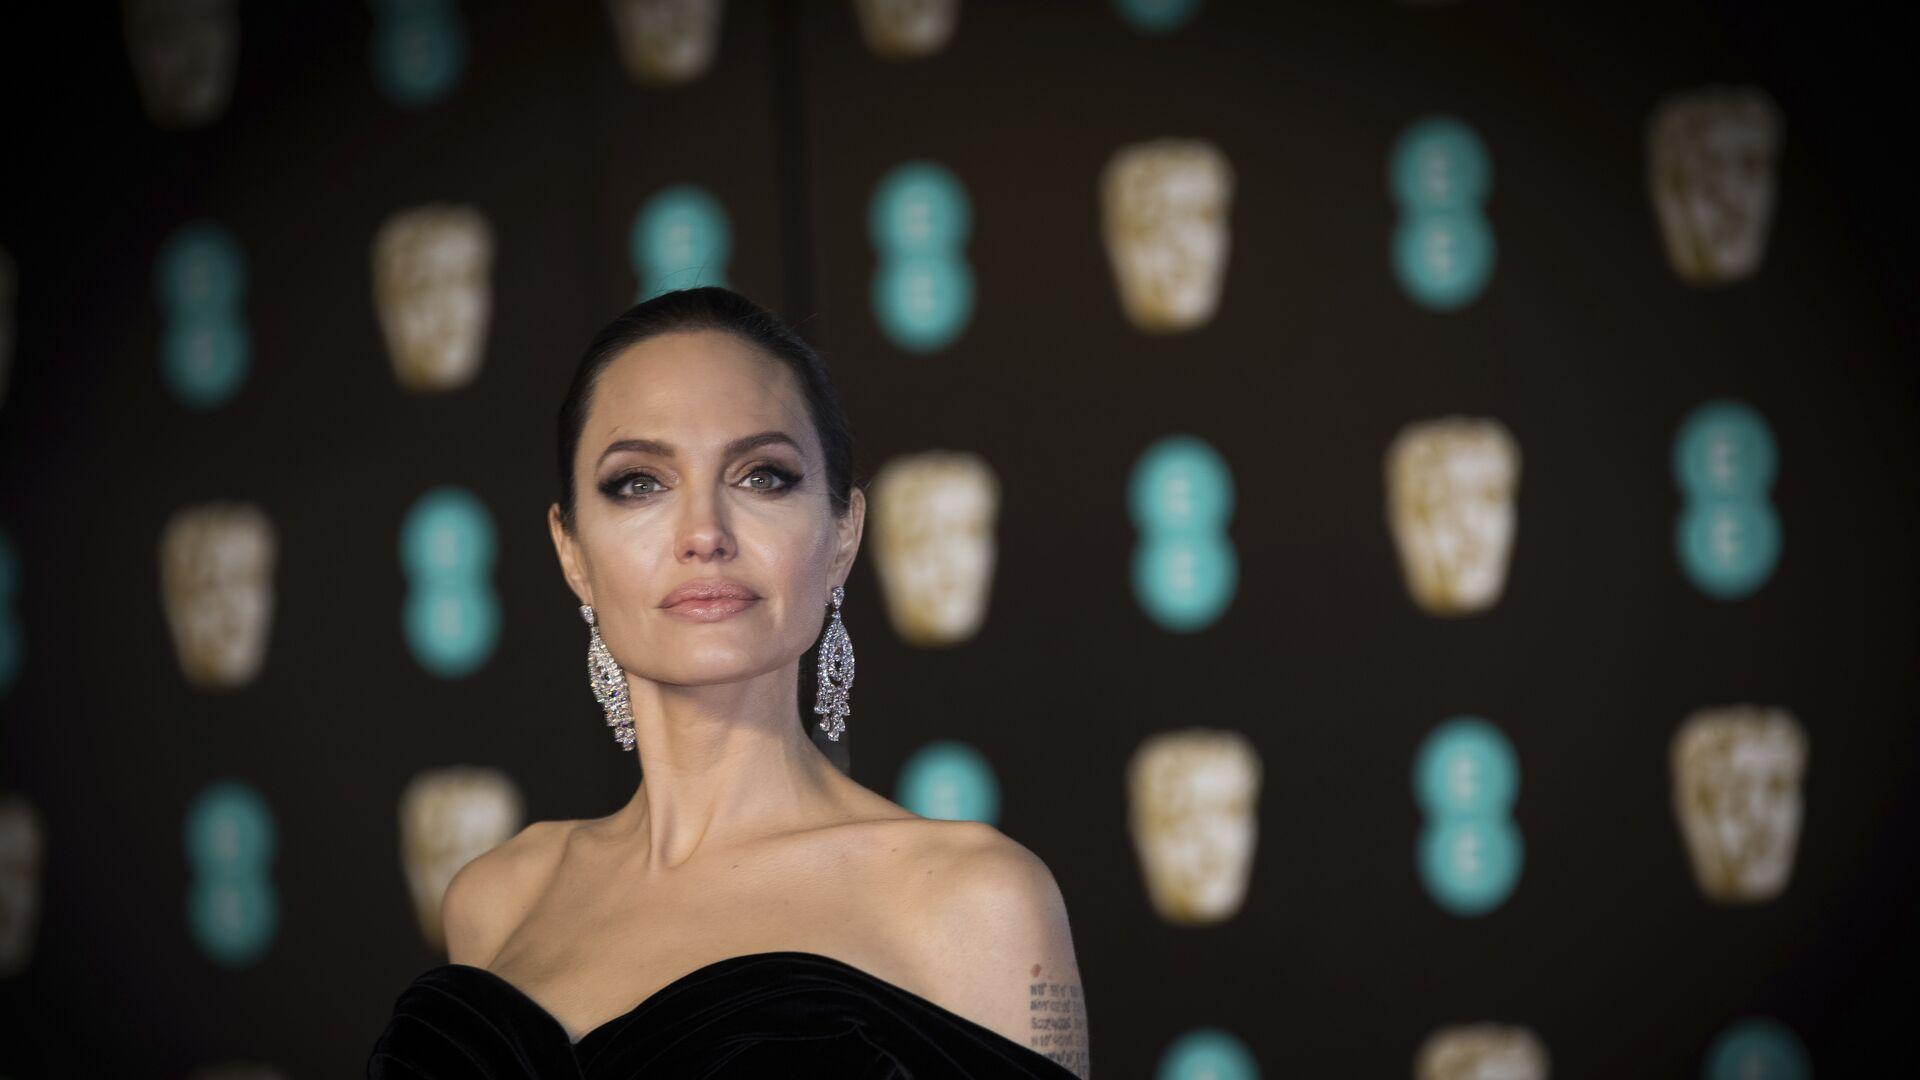 Американская актриса Анджелина Джоли - РИА Новости, 1920, 16.07.2021